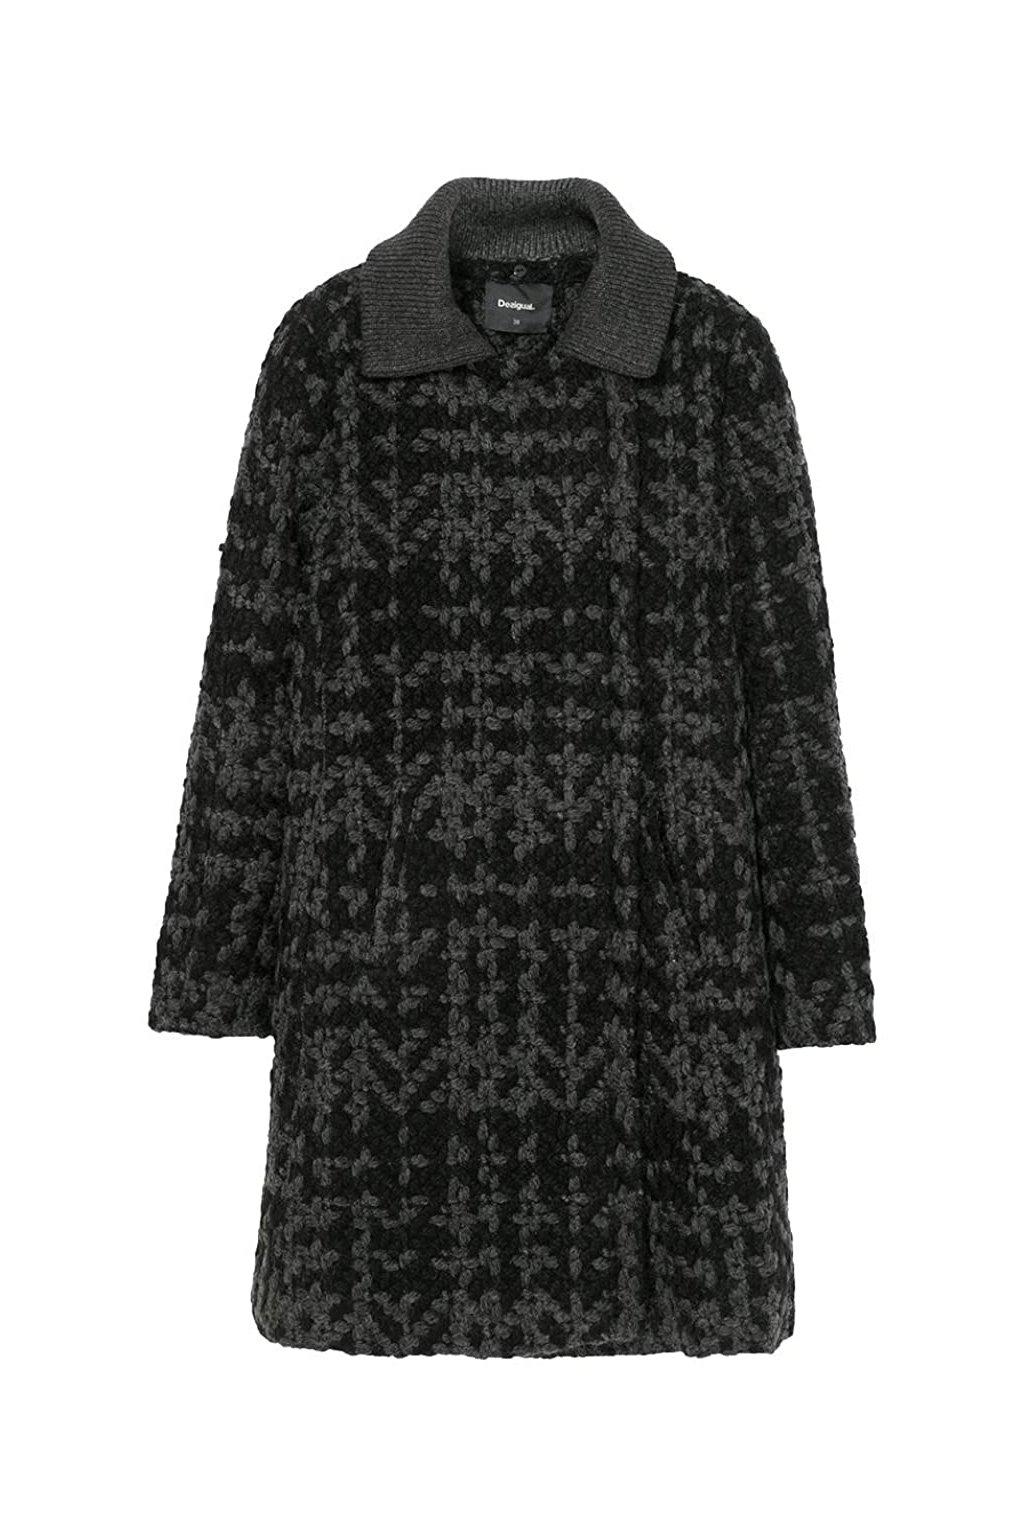 Dámský kabát Desigual 17WWEWH4/2007